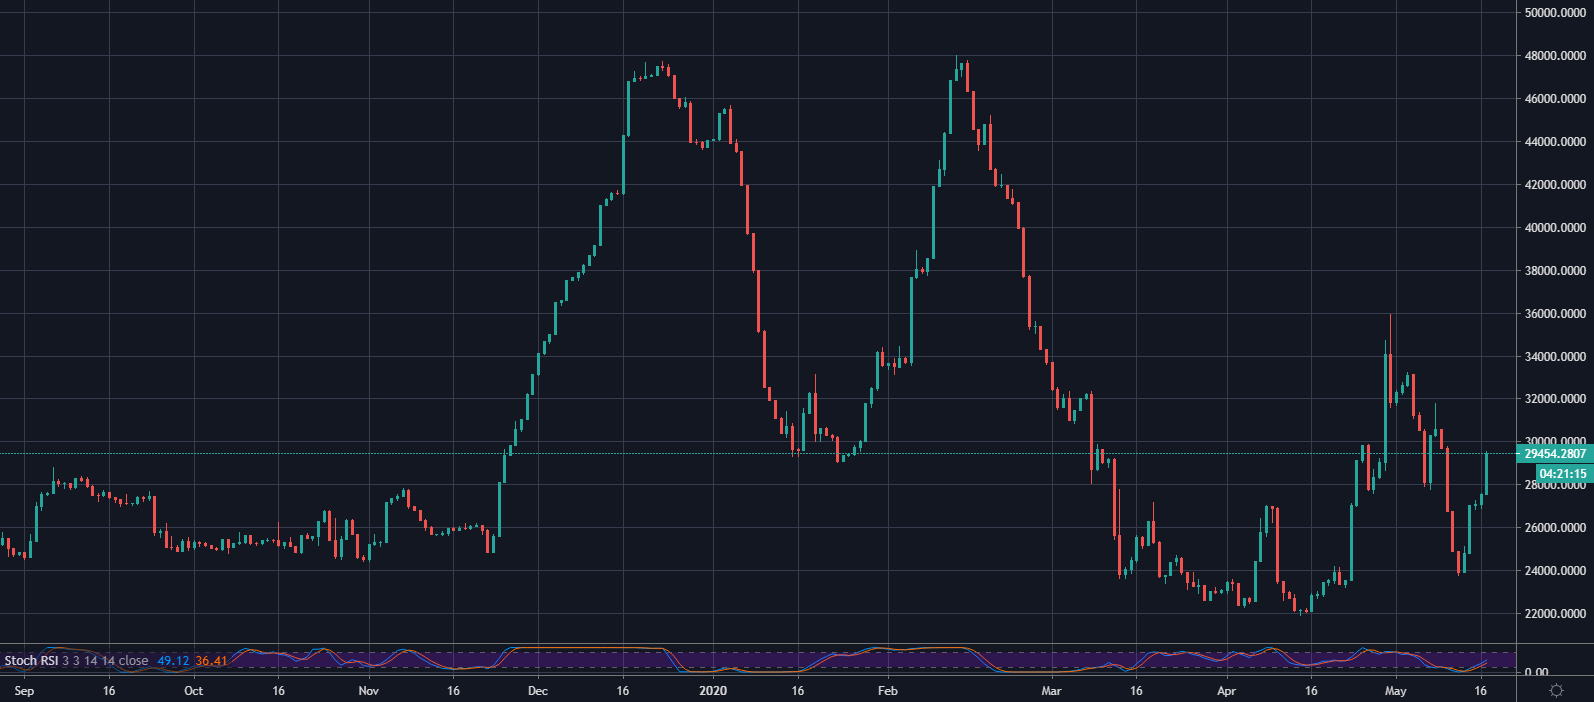 Bitfinex BTC/USD Longs 1D September 2019 - May 2020: TradingView